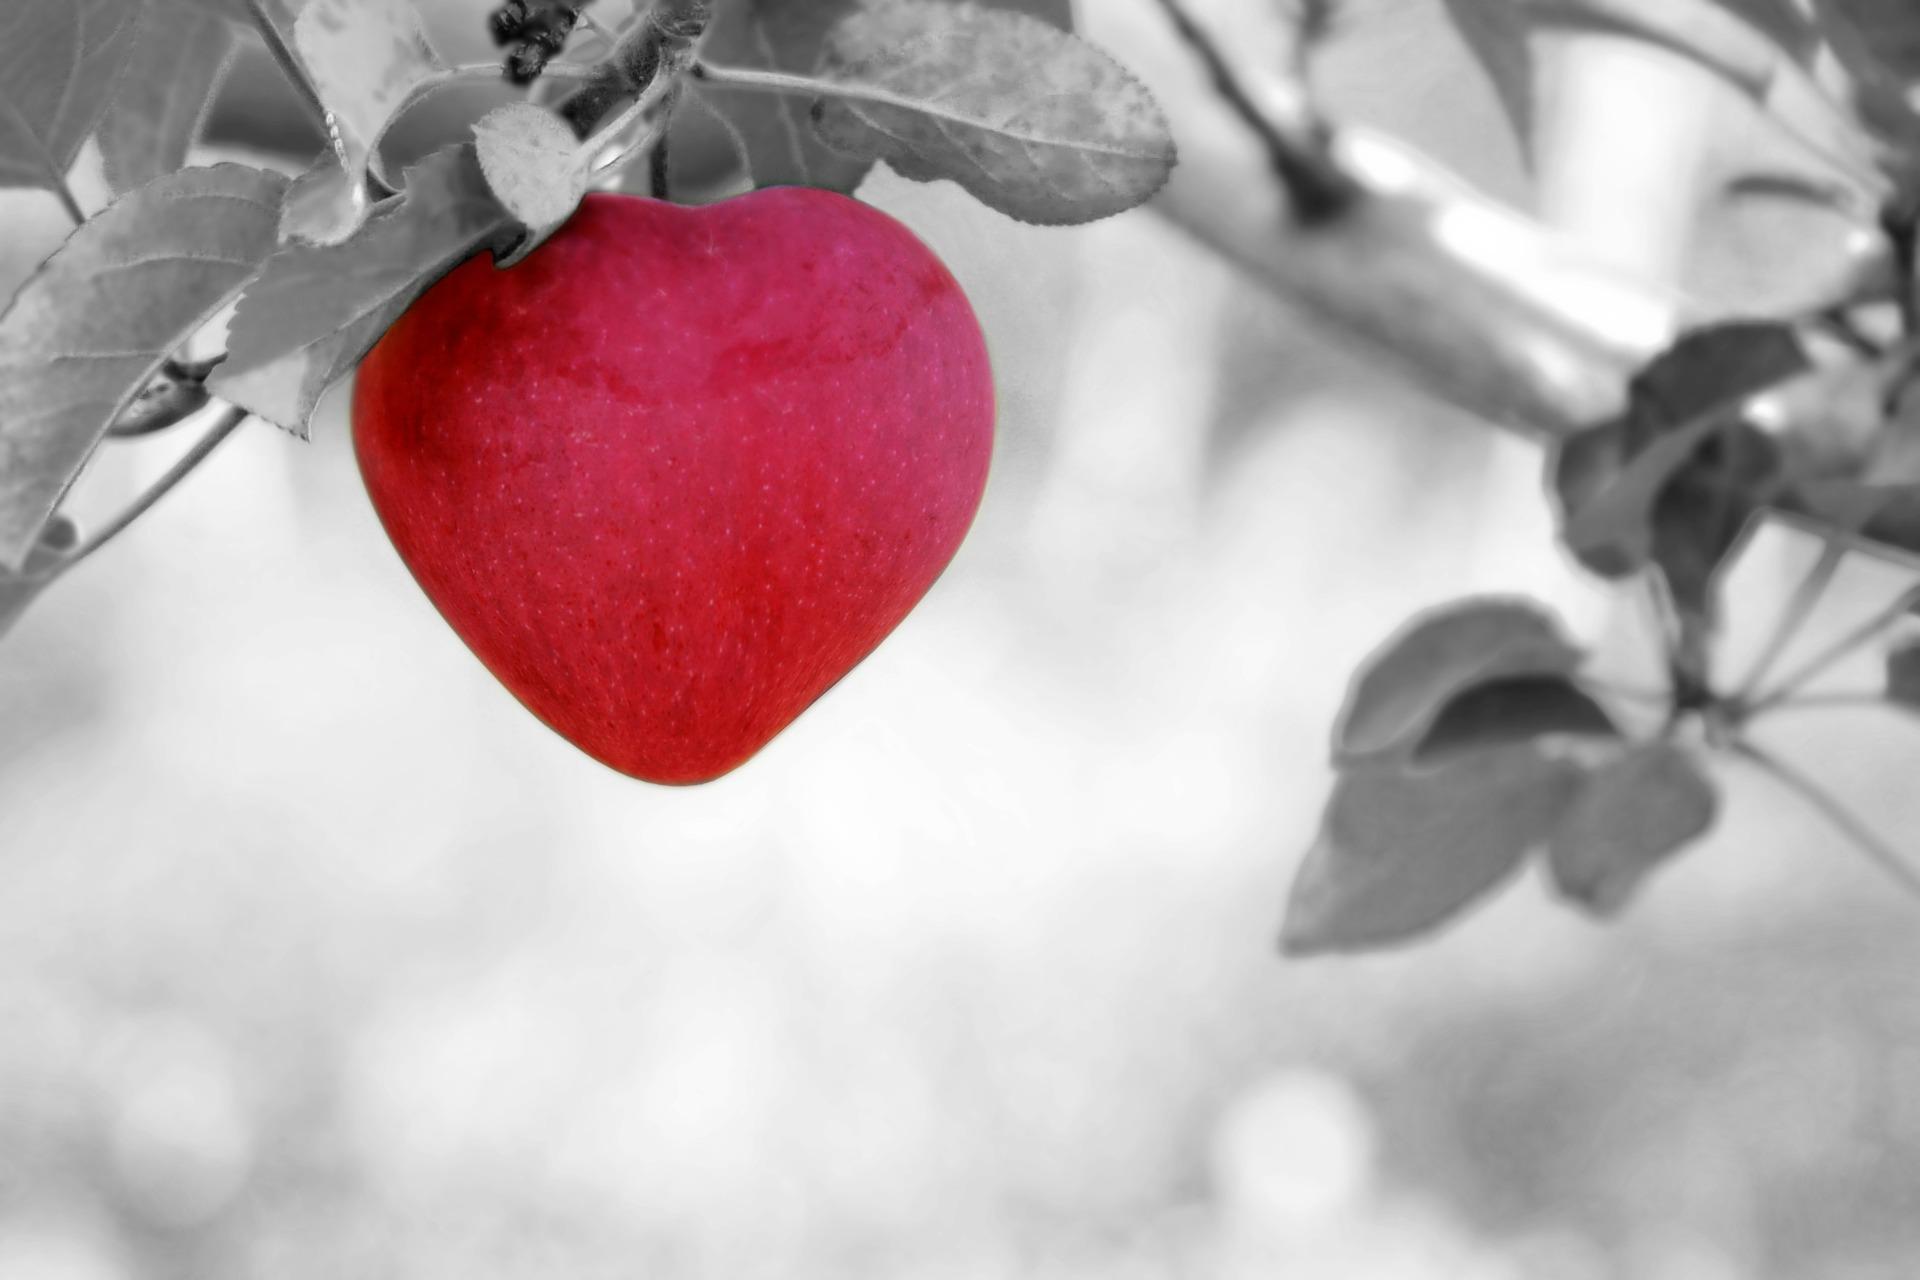 amour, coeur, fruits, pomme, arbre - Fonds d'écran HD - Professor-falken.com